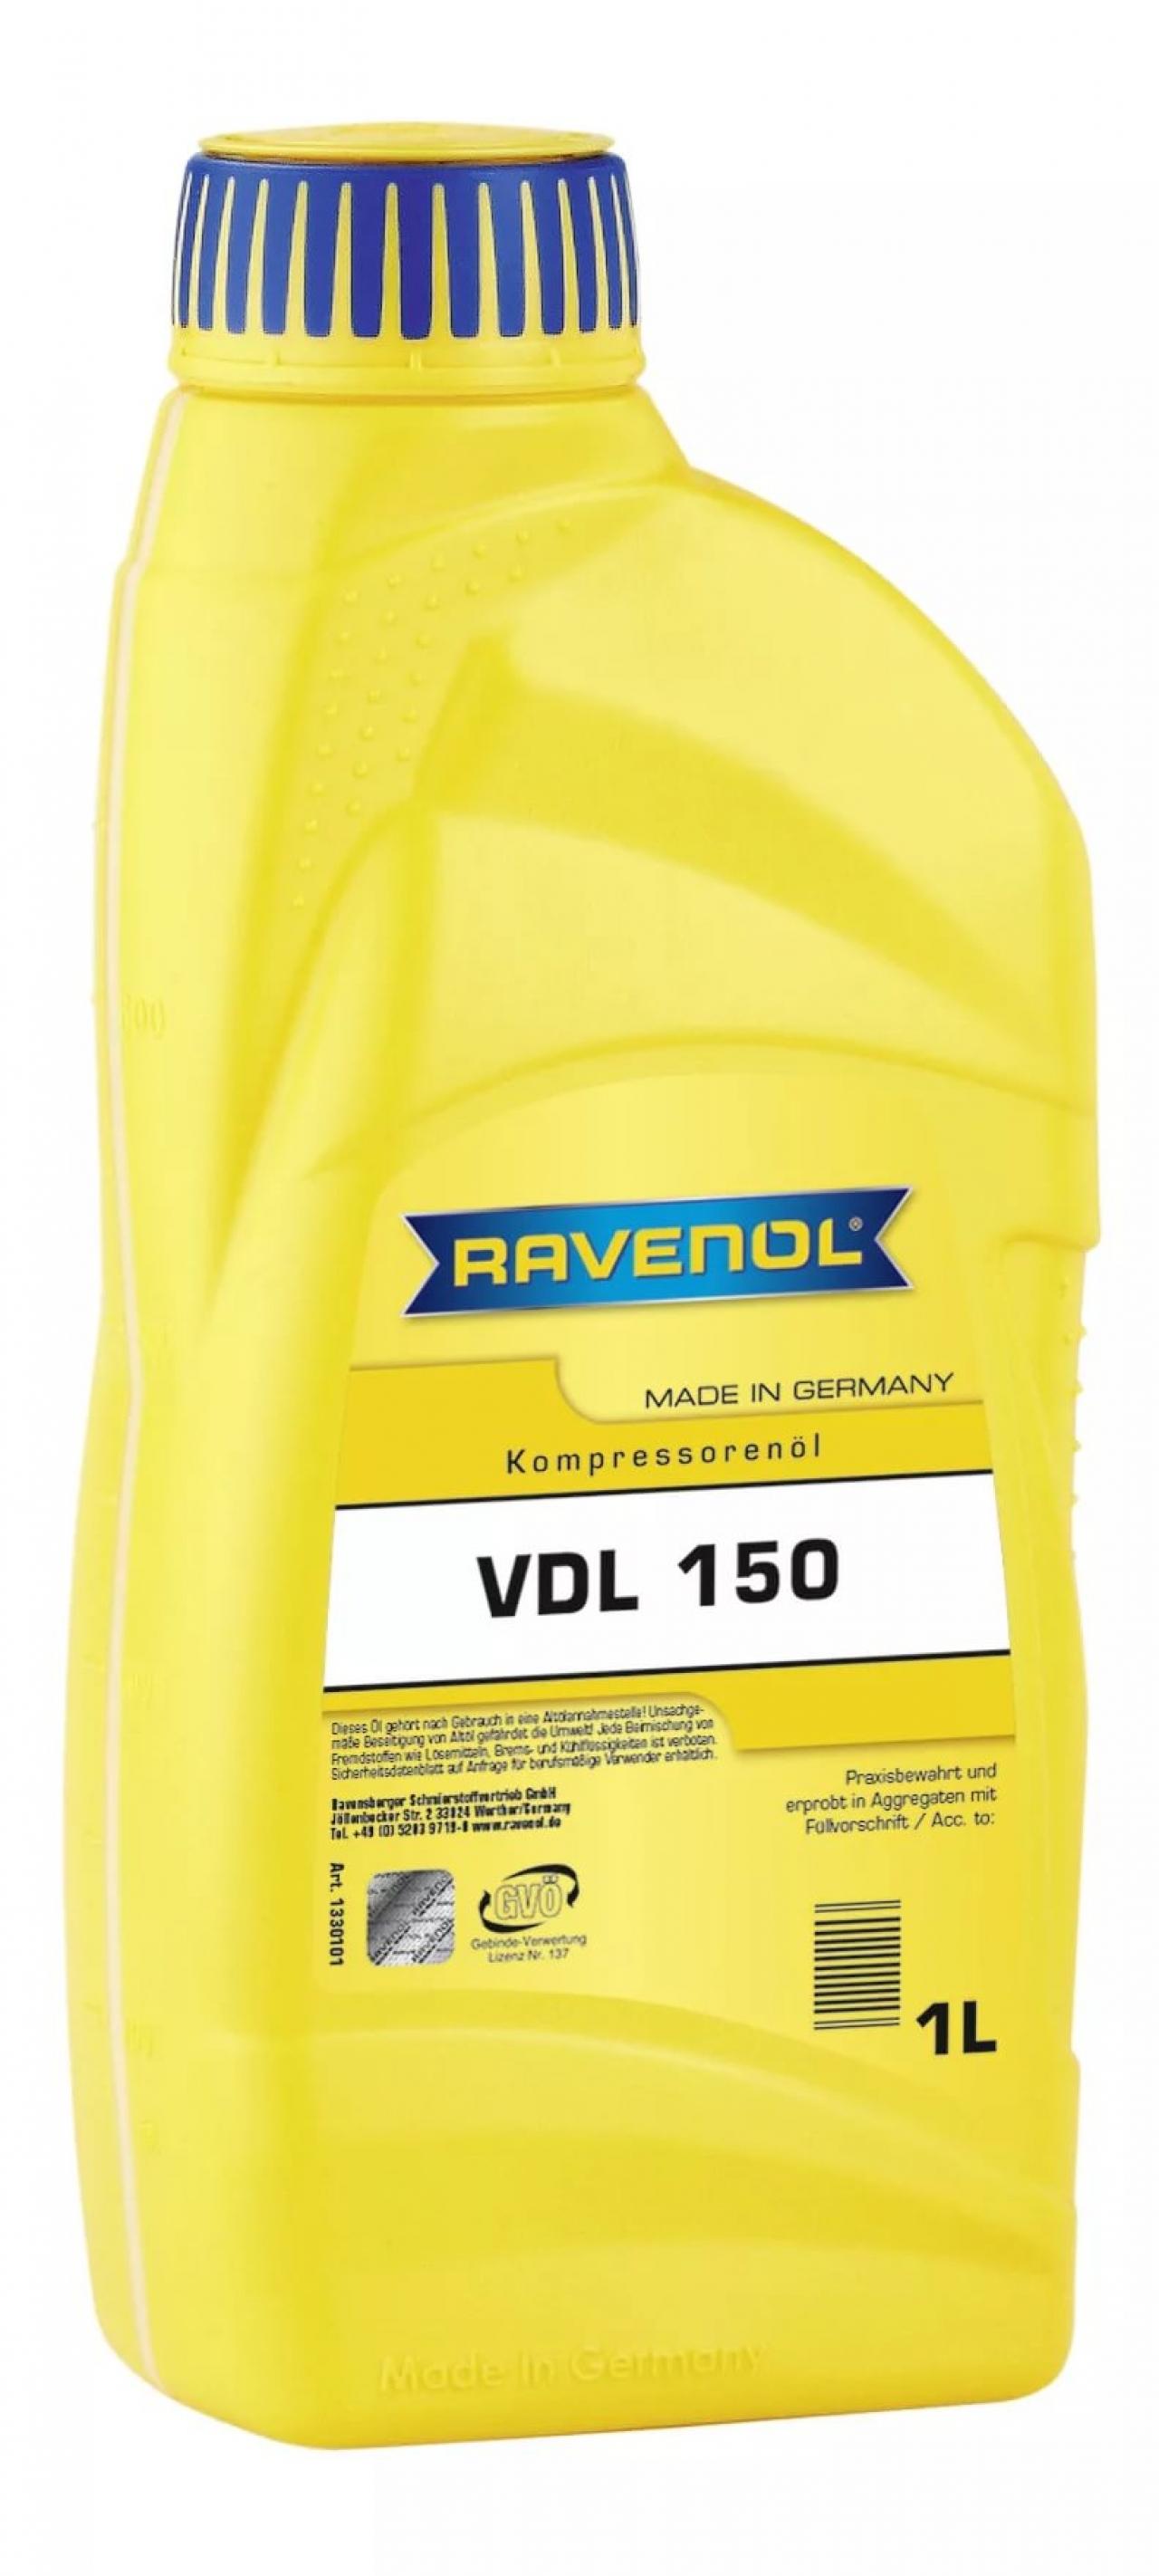 Компрессорное масло RAVENOL Kompressorenoel VDL 150 1л